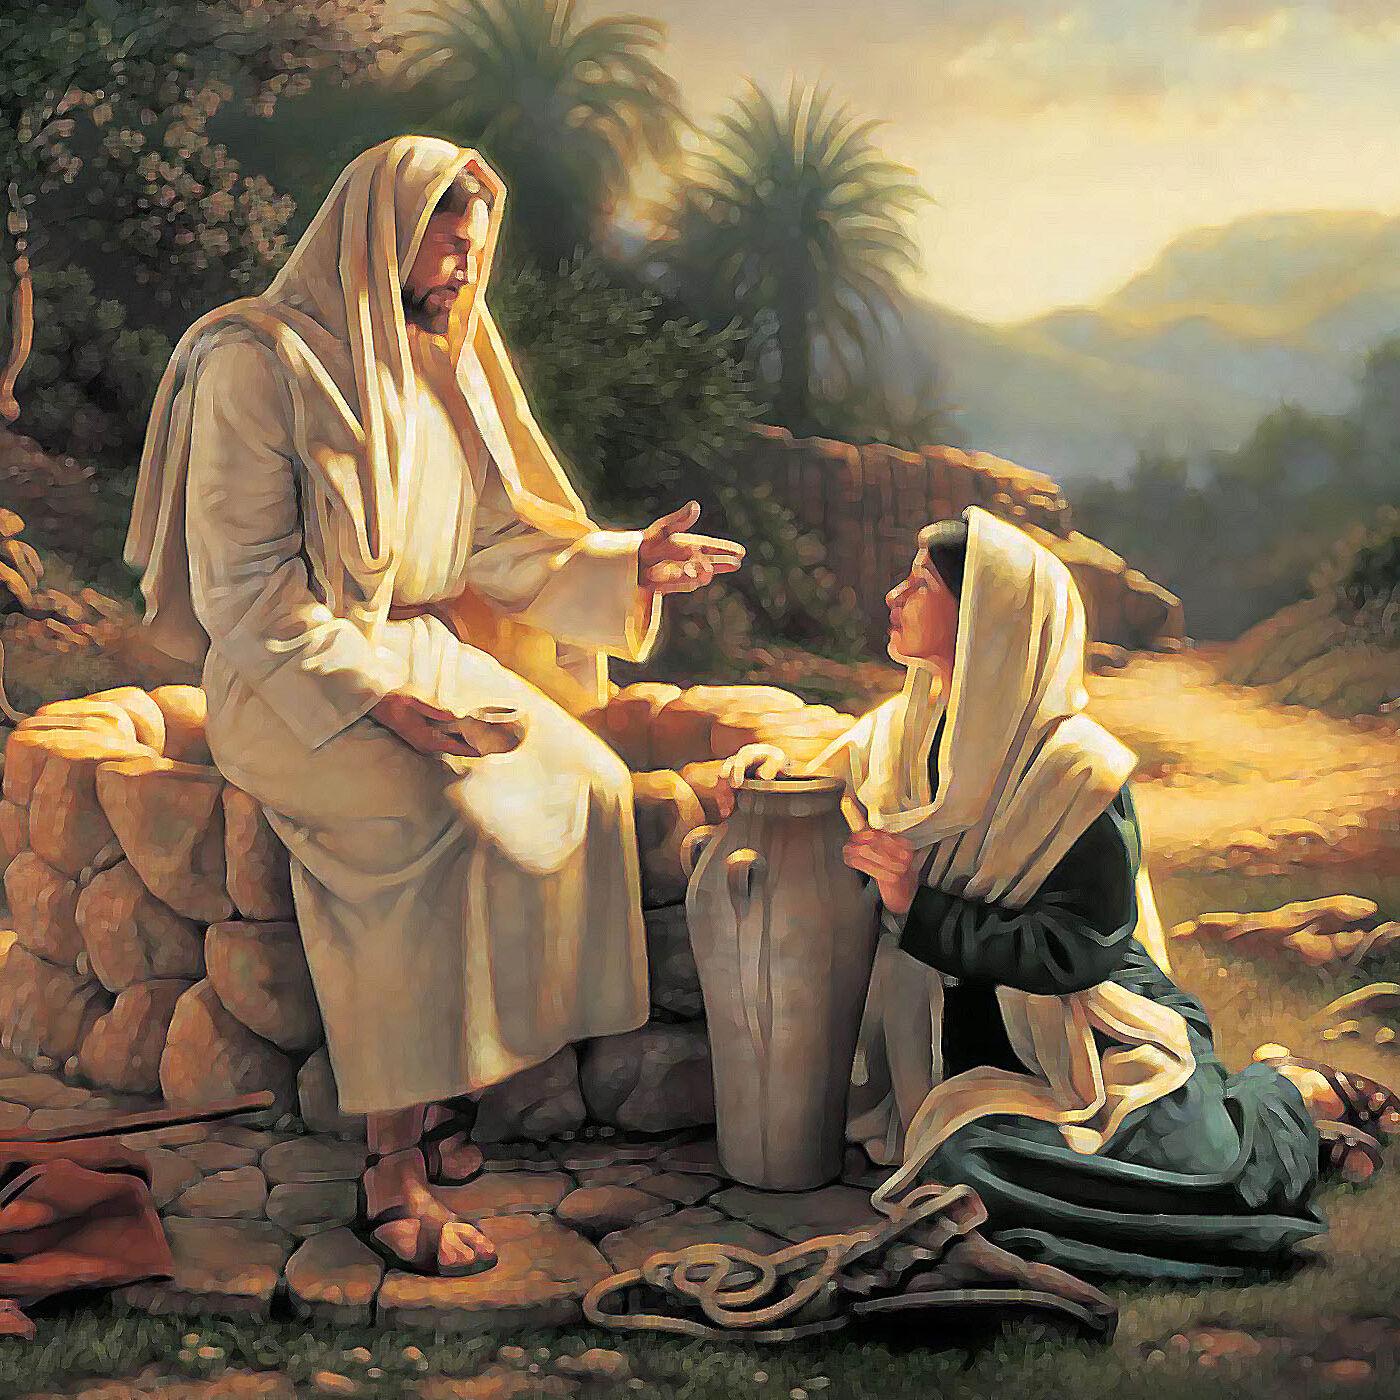 riflessioni sul Vangelo di Mercoledì 13 Gennaio 2021 (Mc 1, 29-39) - Apostola Simona